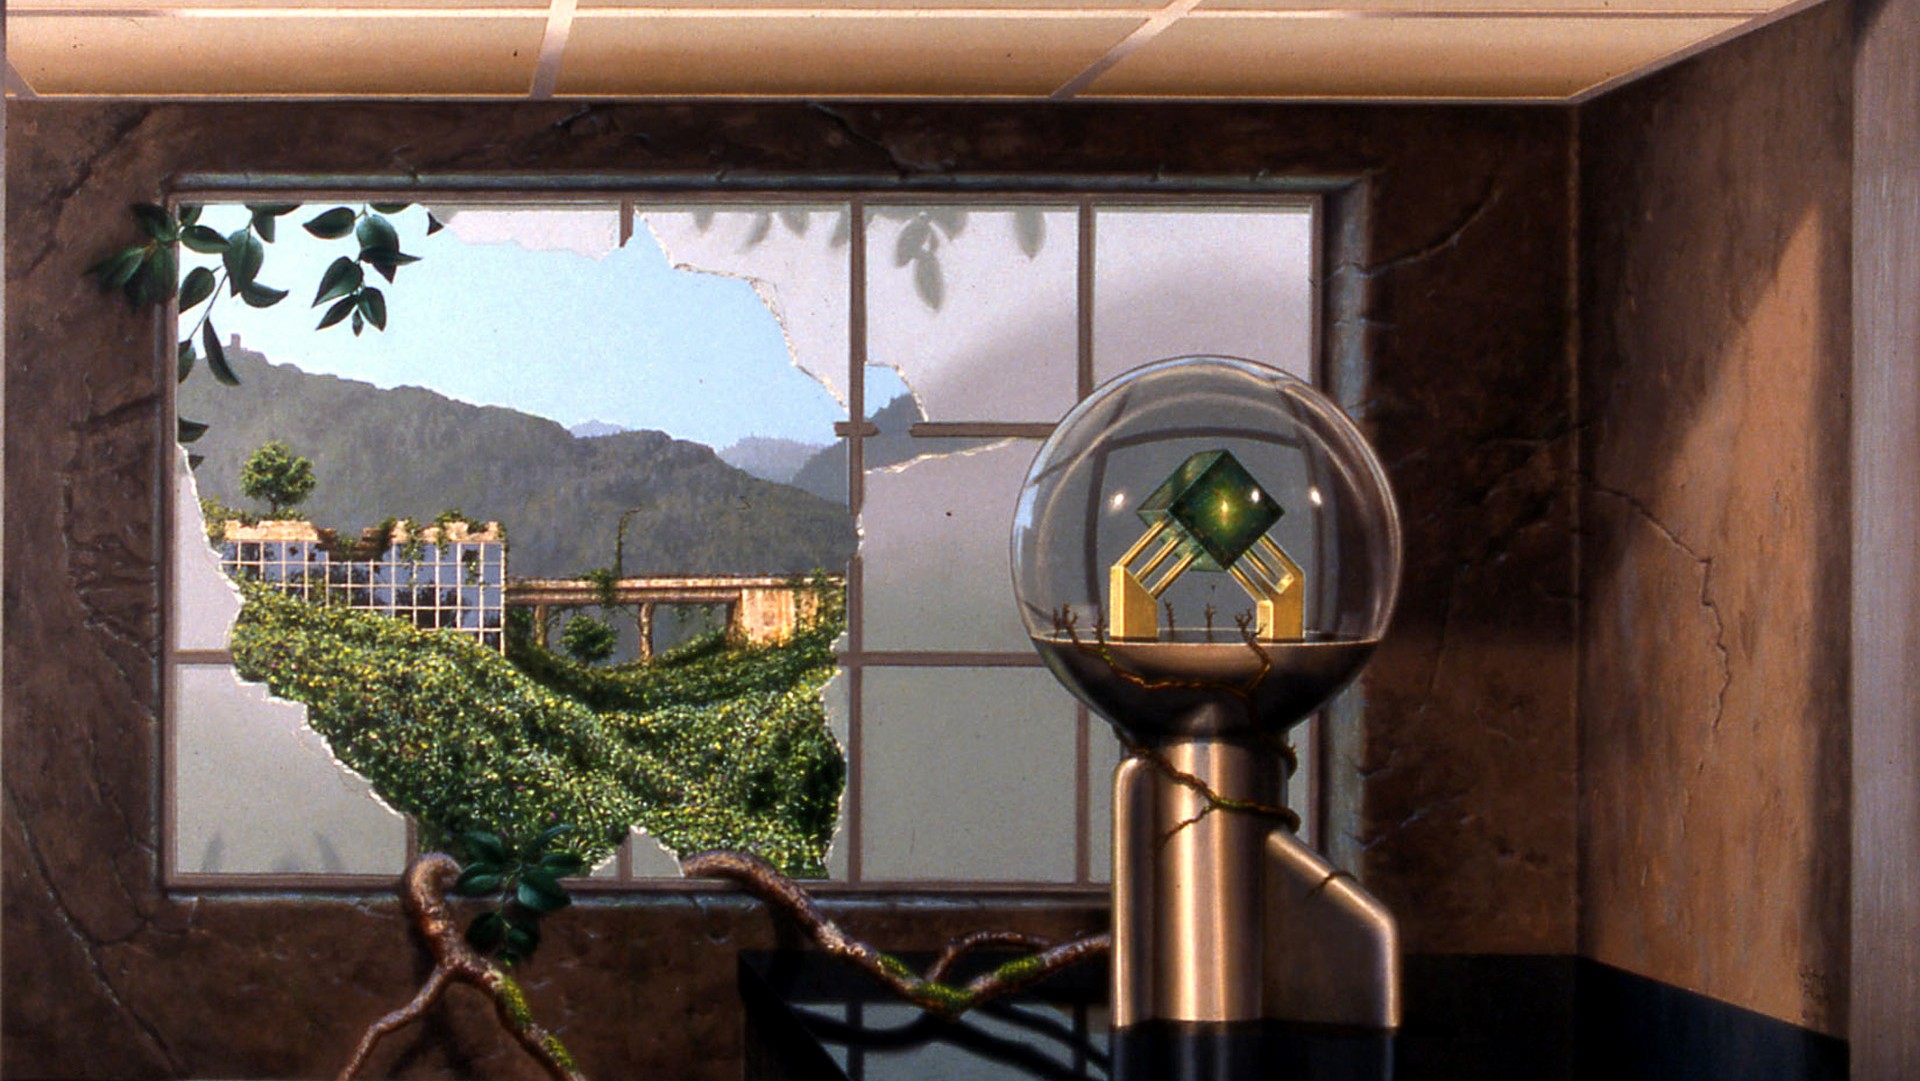 File:Technology of the Future Past, Trompe l\'oeil mural by John Pugh ...